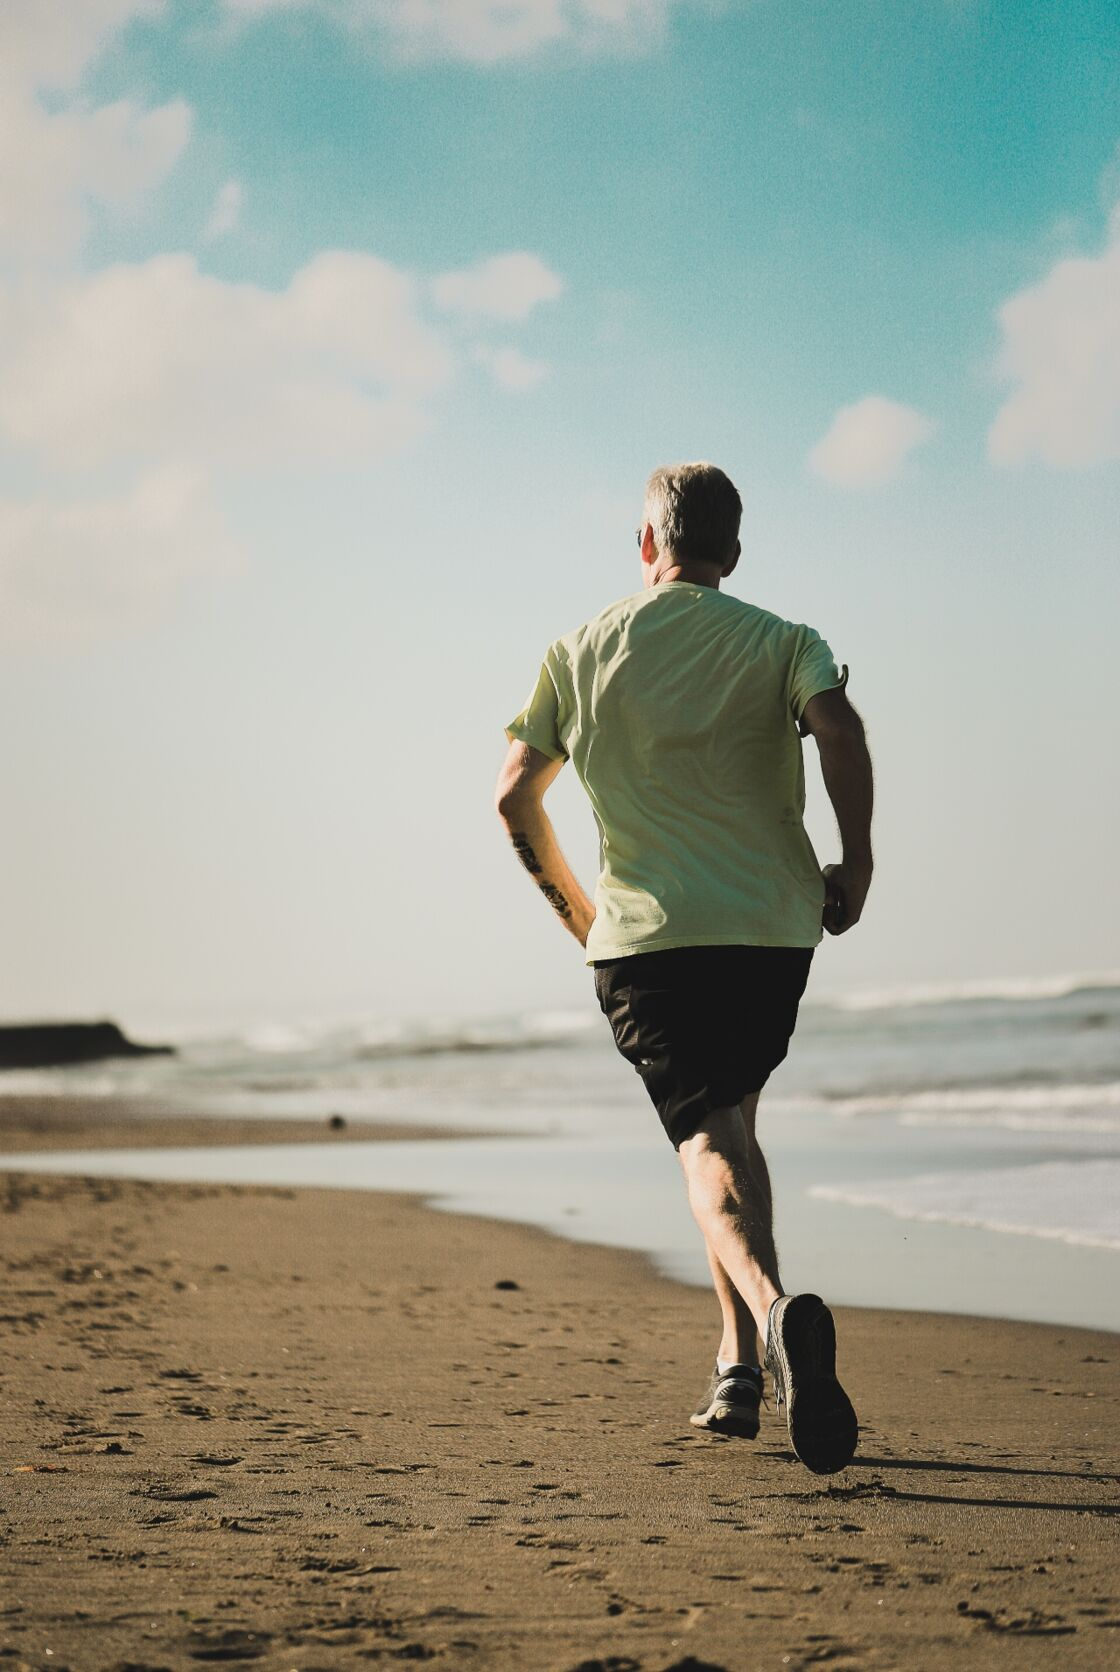 50 Minuten pro Woche zu joggen verlängert bereits die Lebensdauer!